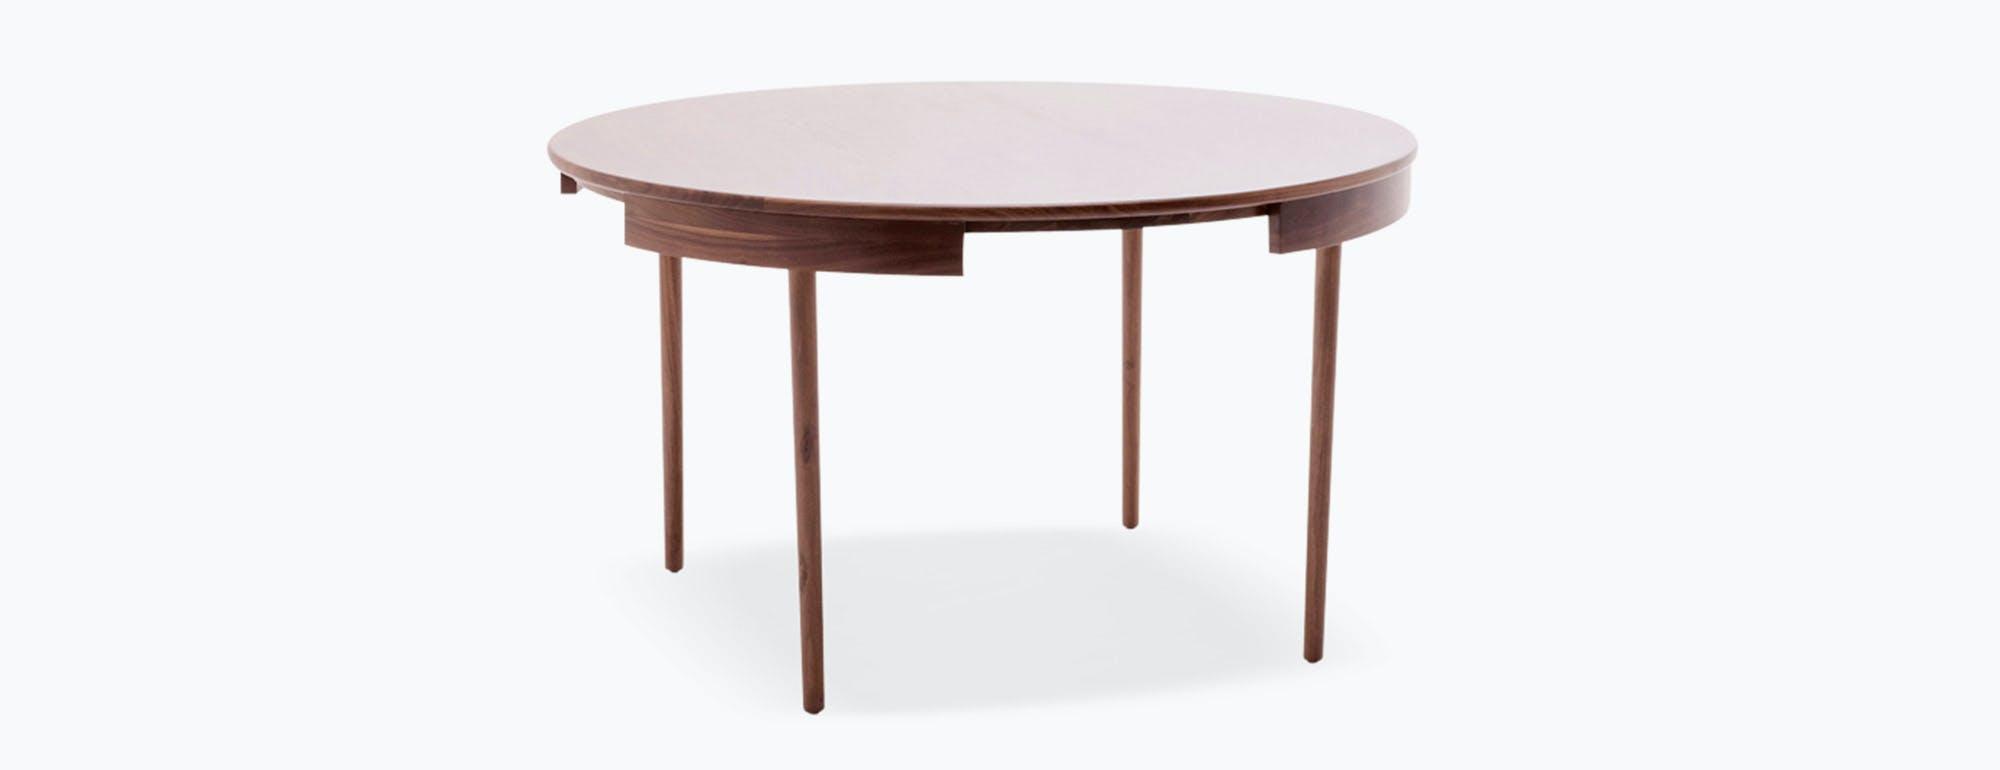 toscano dining table joybird